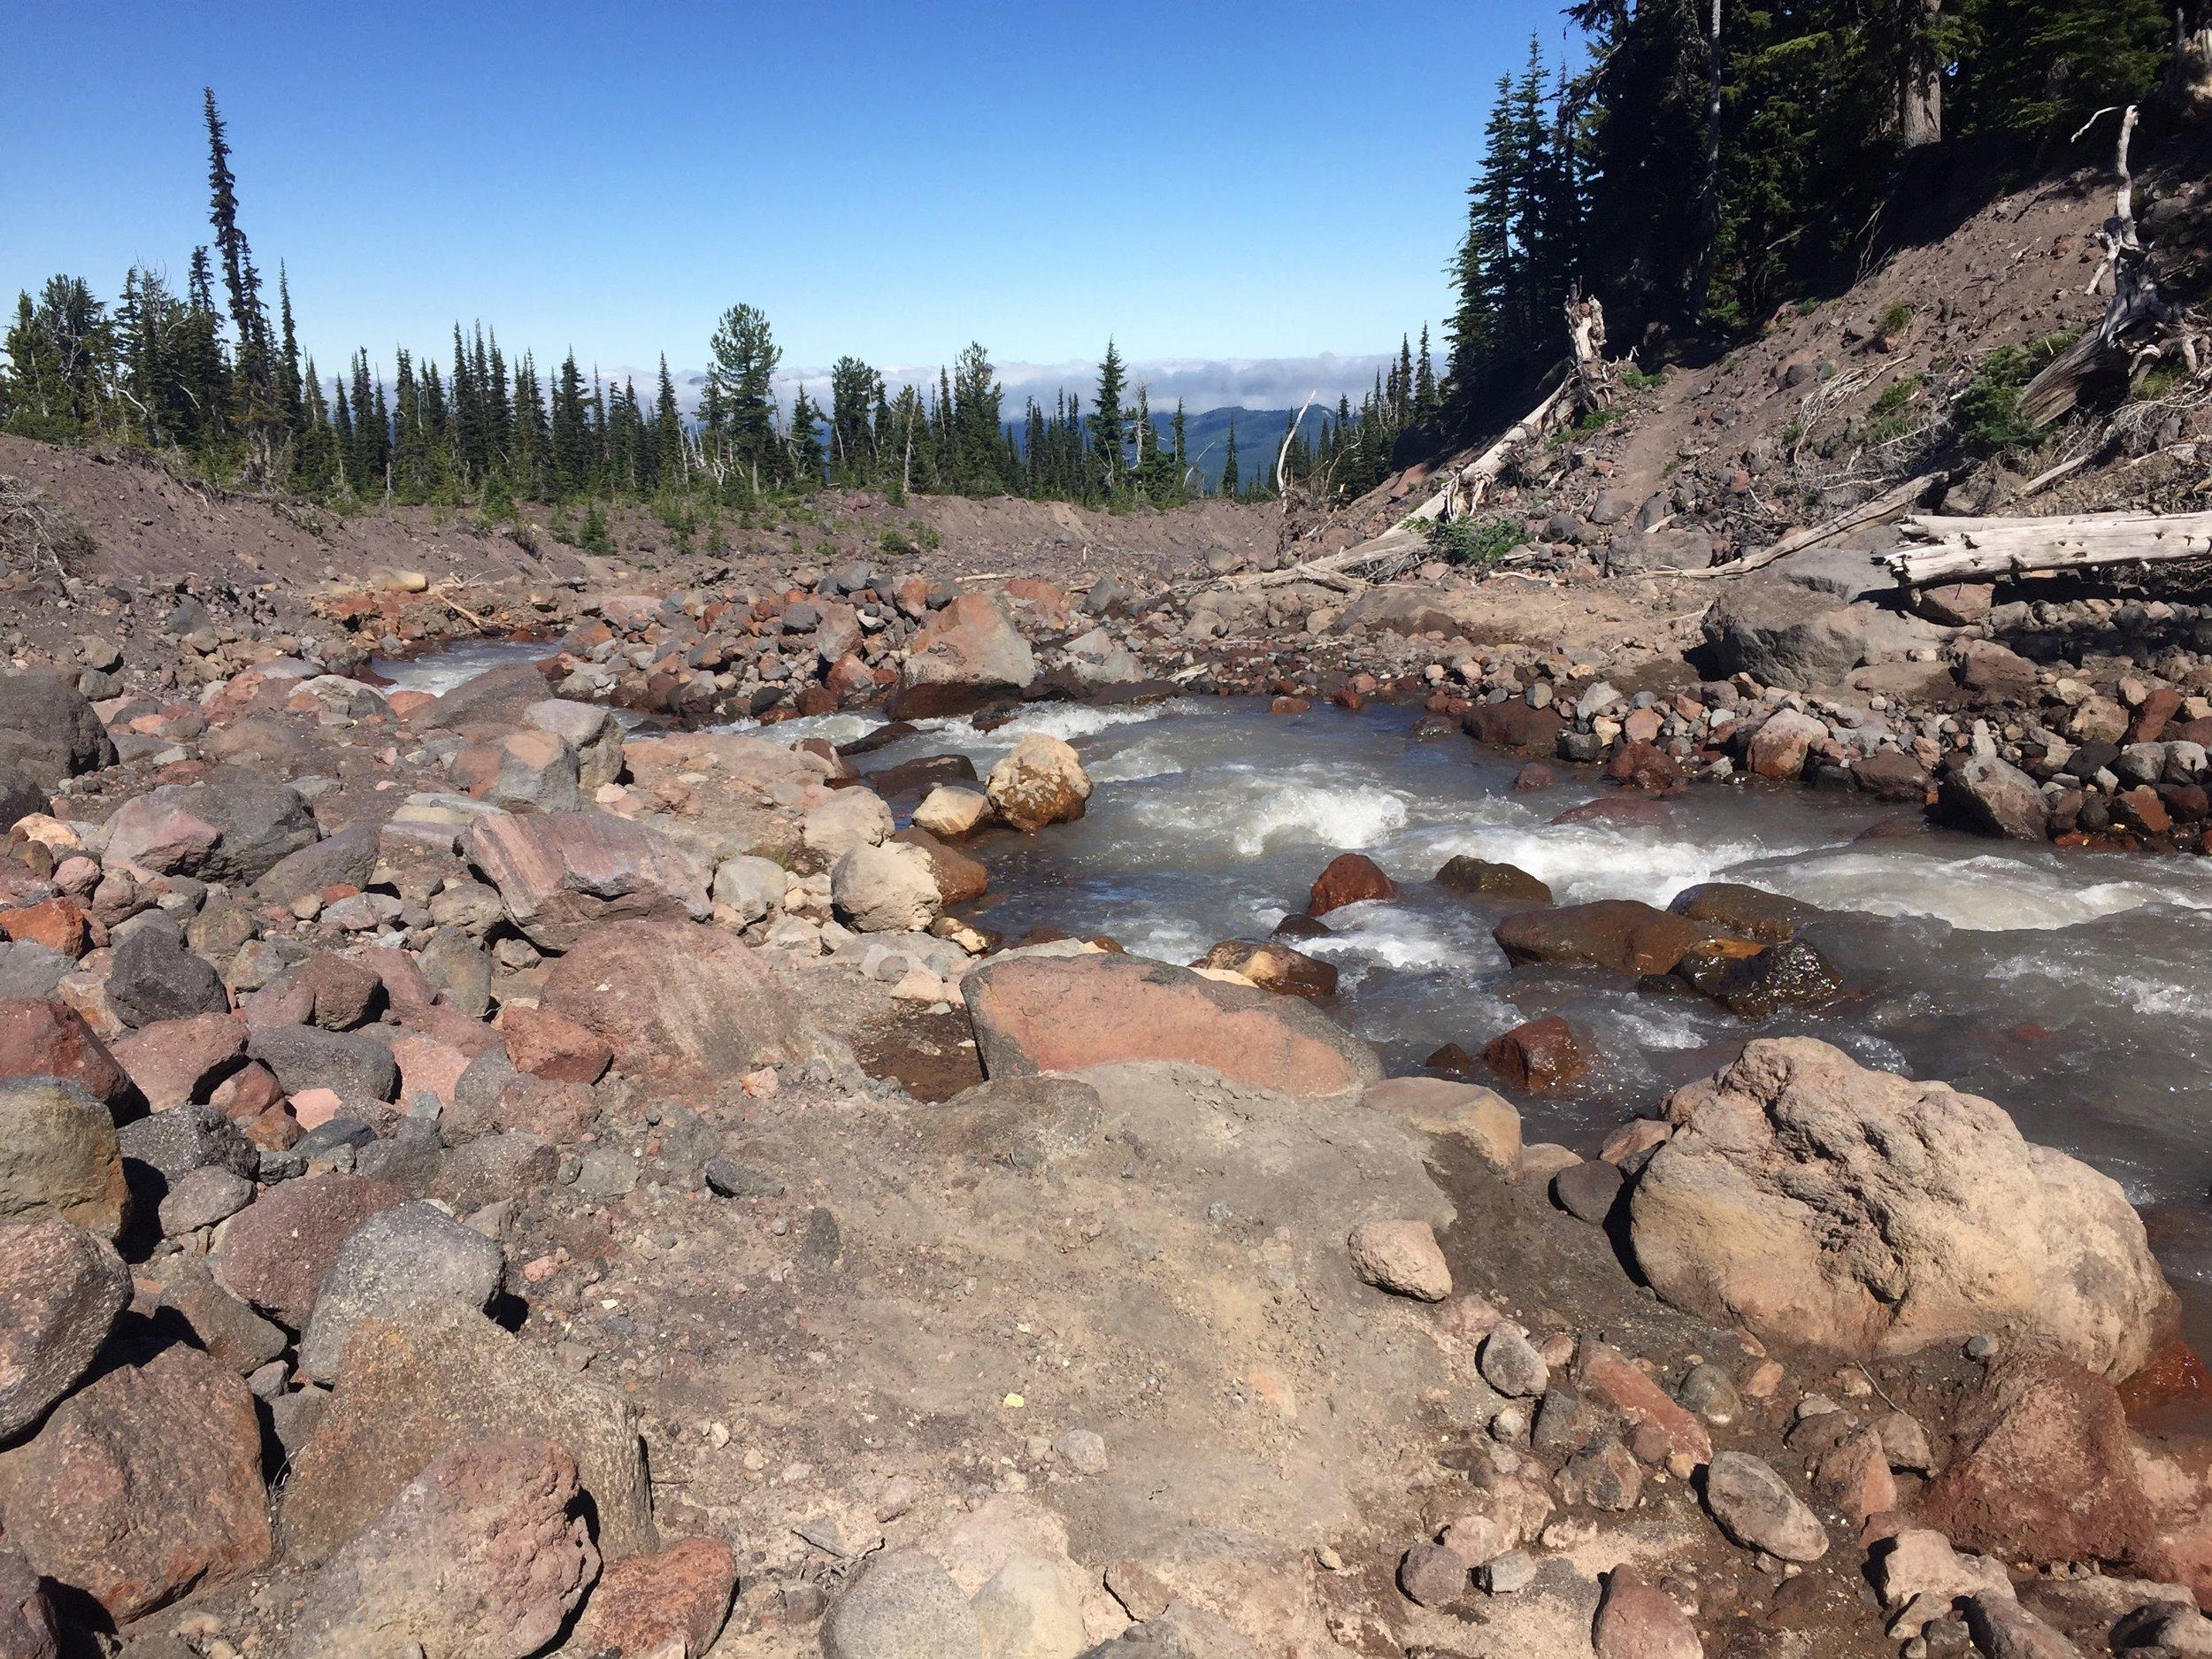 Silty volcanic creeks